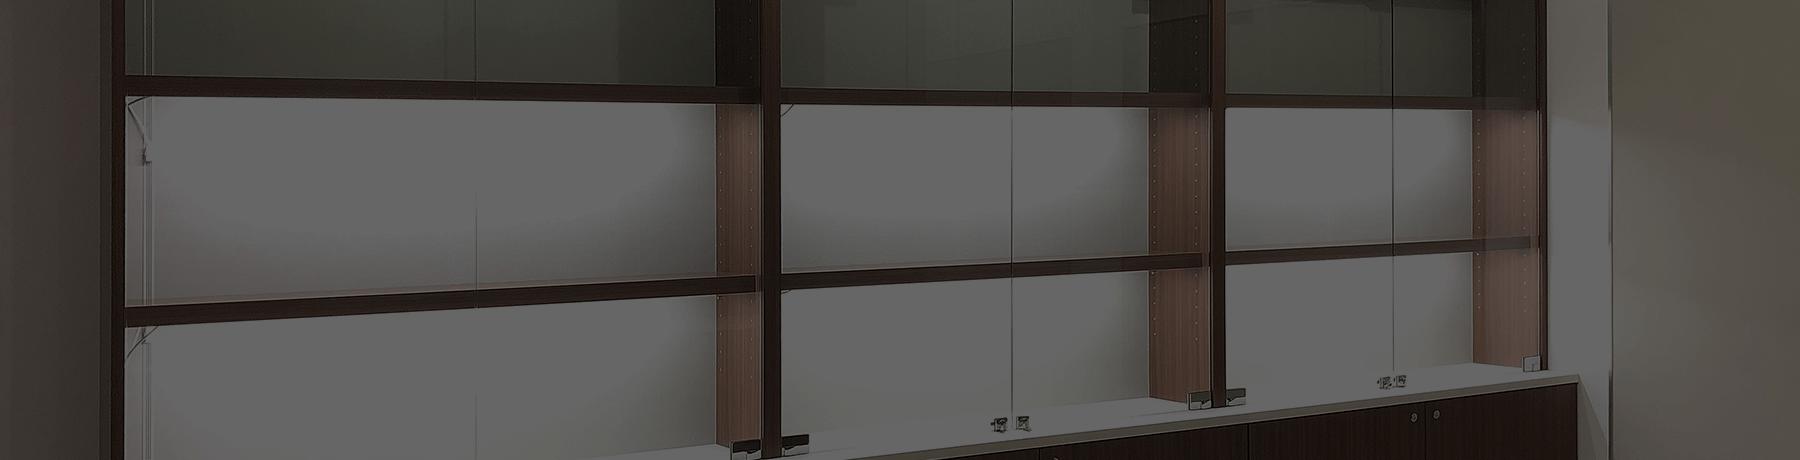 H様邸 展示スペース 施工事例 株式会社イーズ企画工房